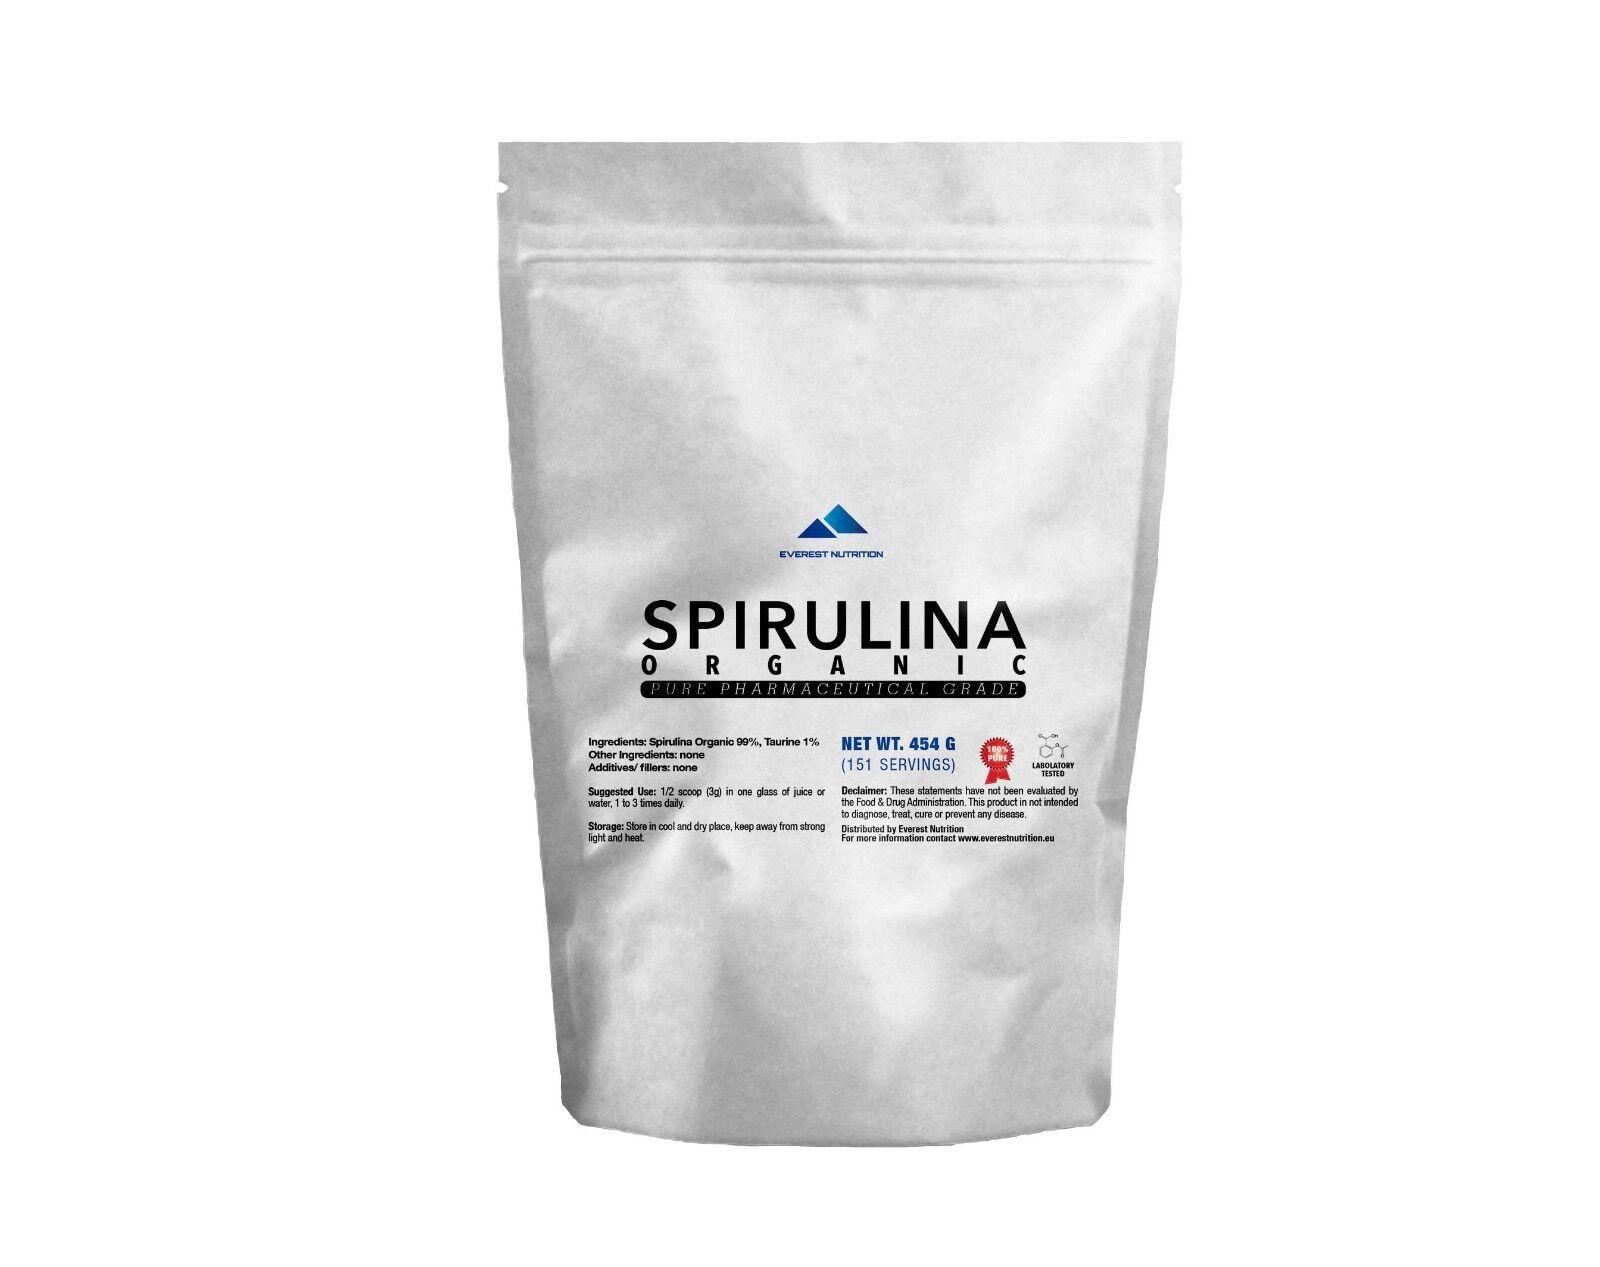 SPIRULINA ORGANIC 100% PURE POWDER SUPERFOOD